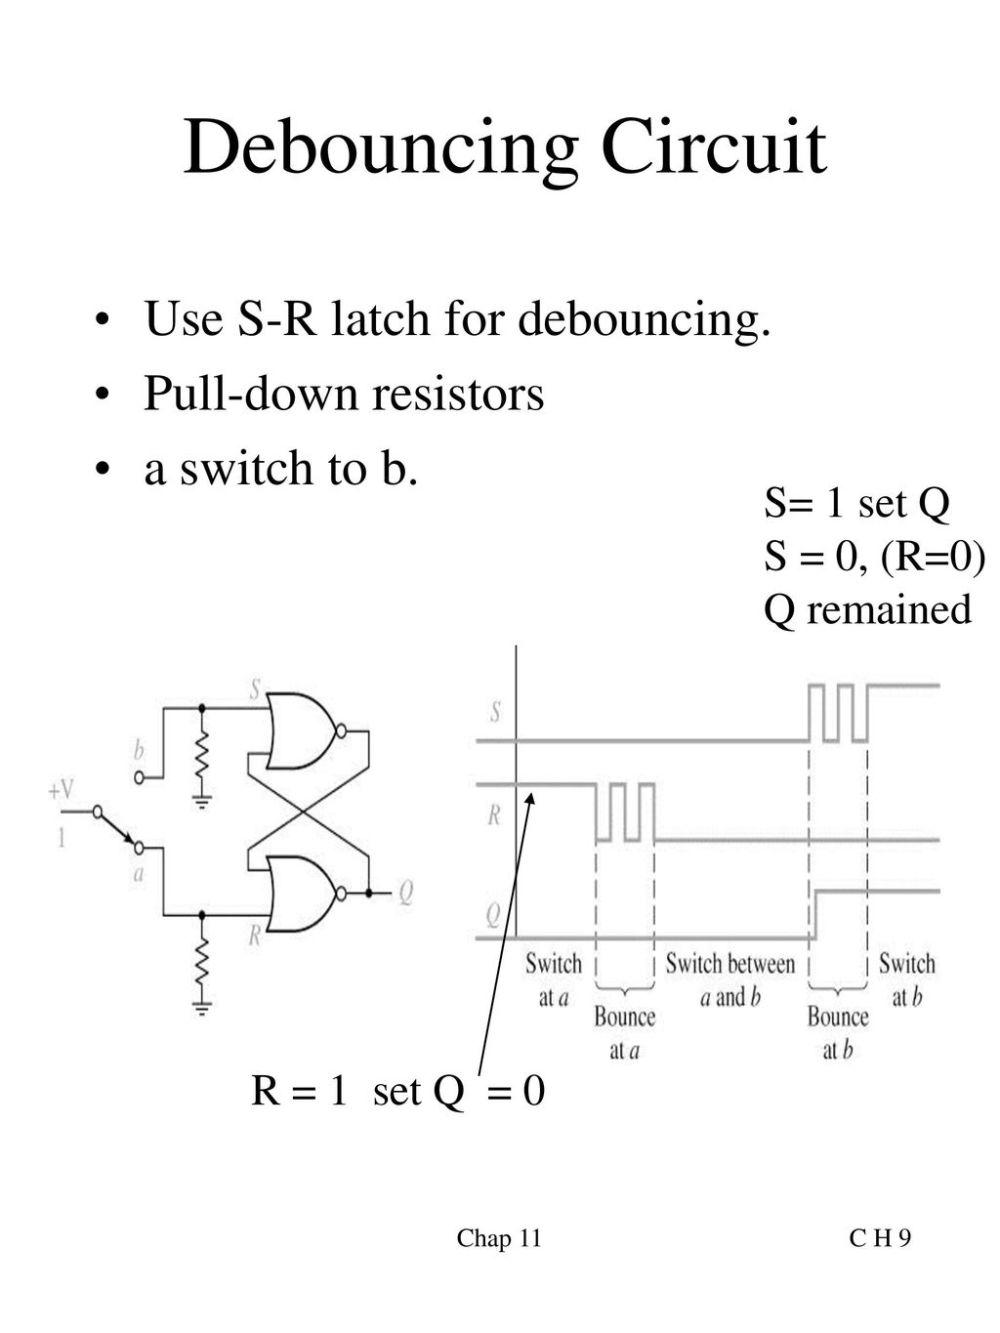 medium resolution of debouncing circuit use s r latch for debouncing pull down resistors